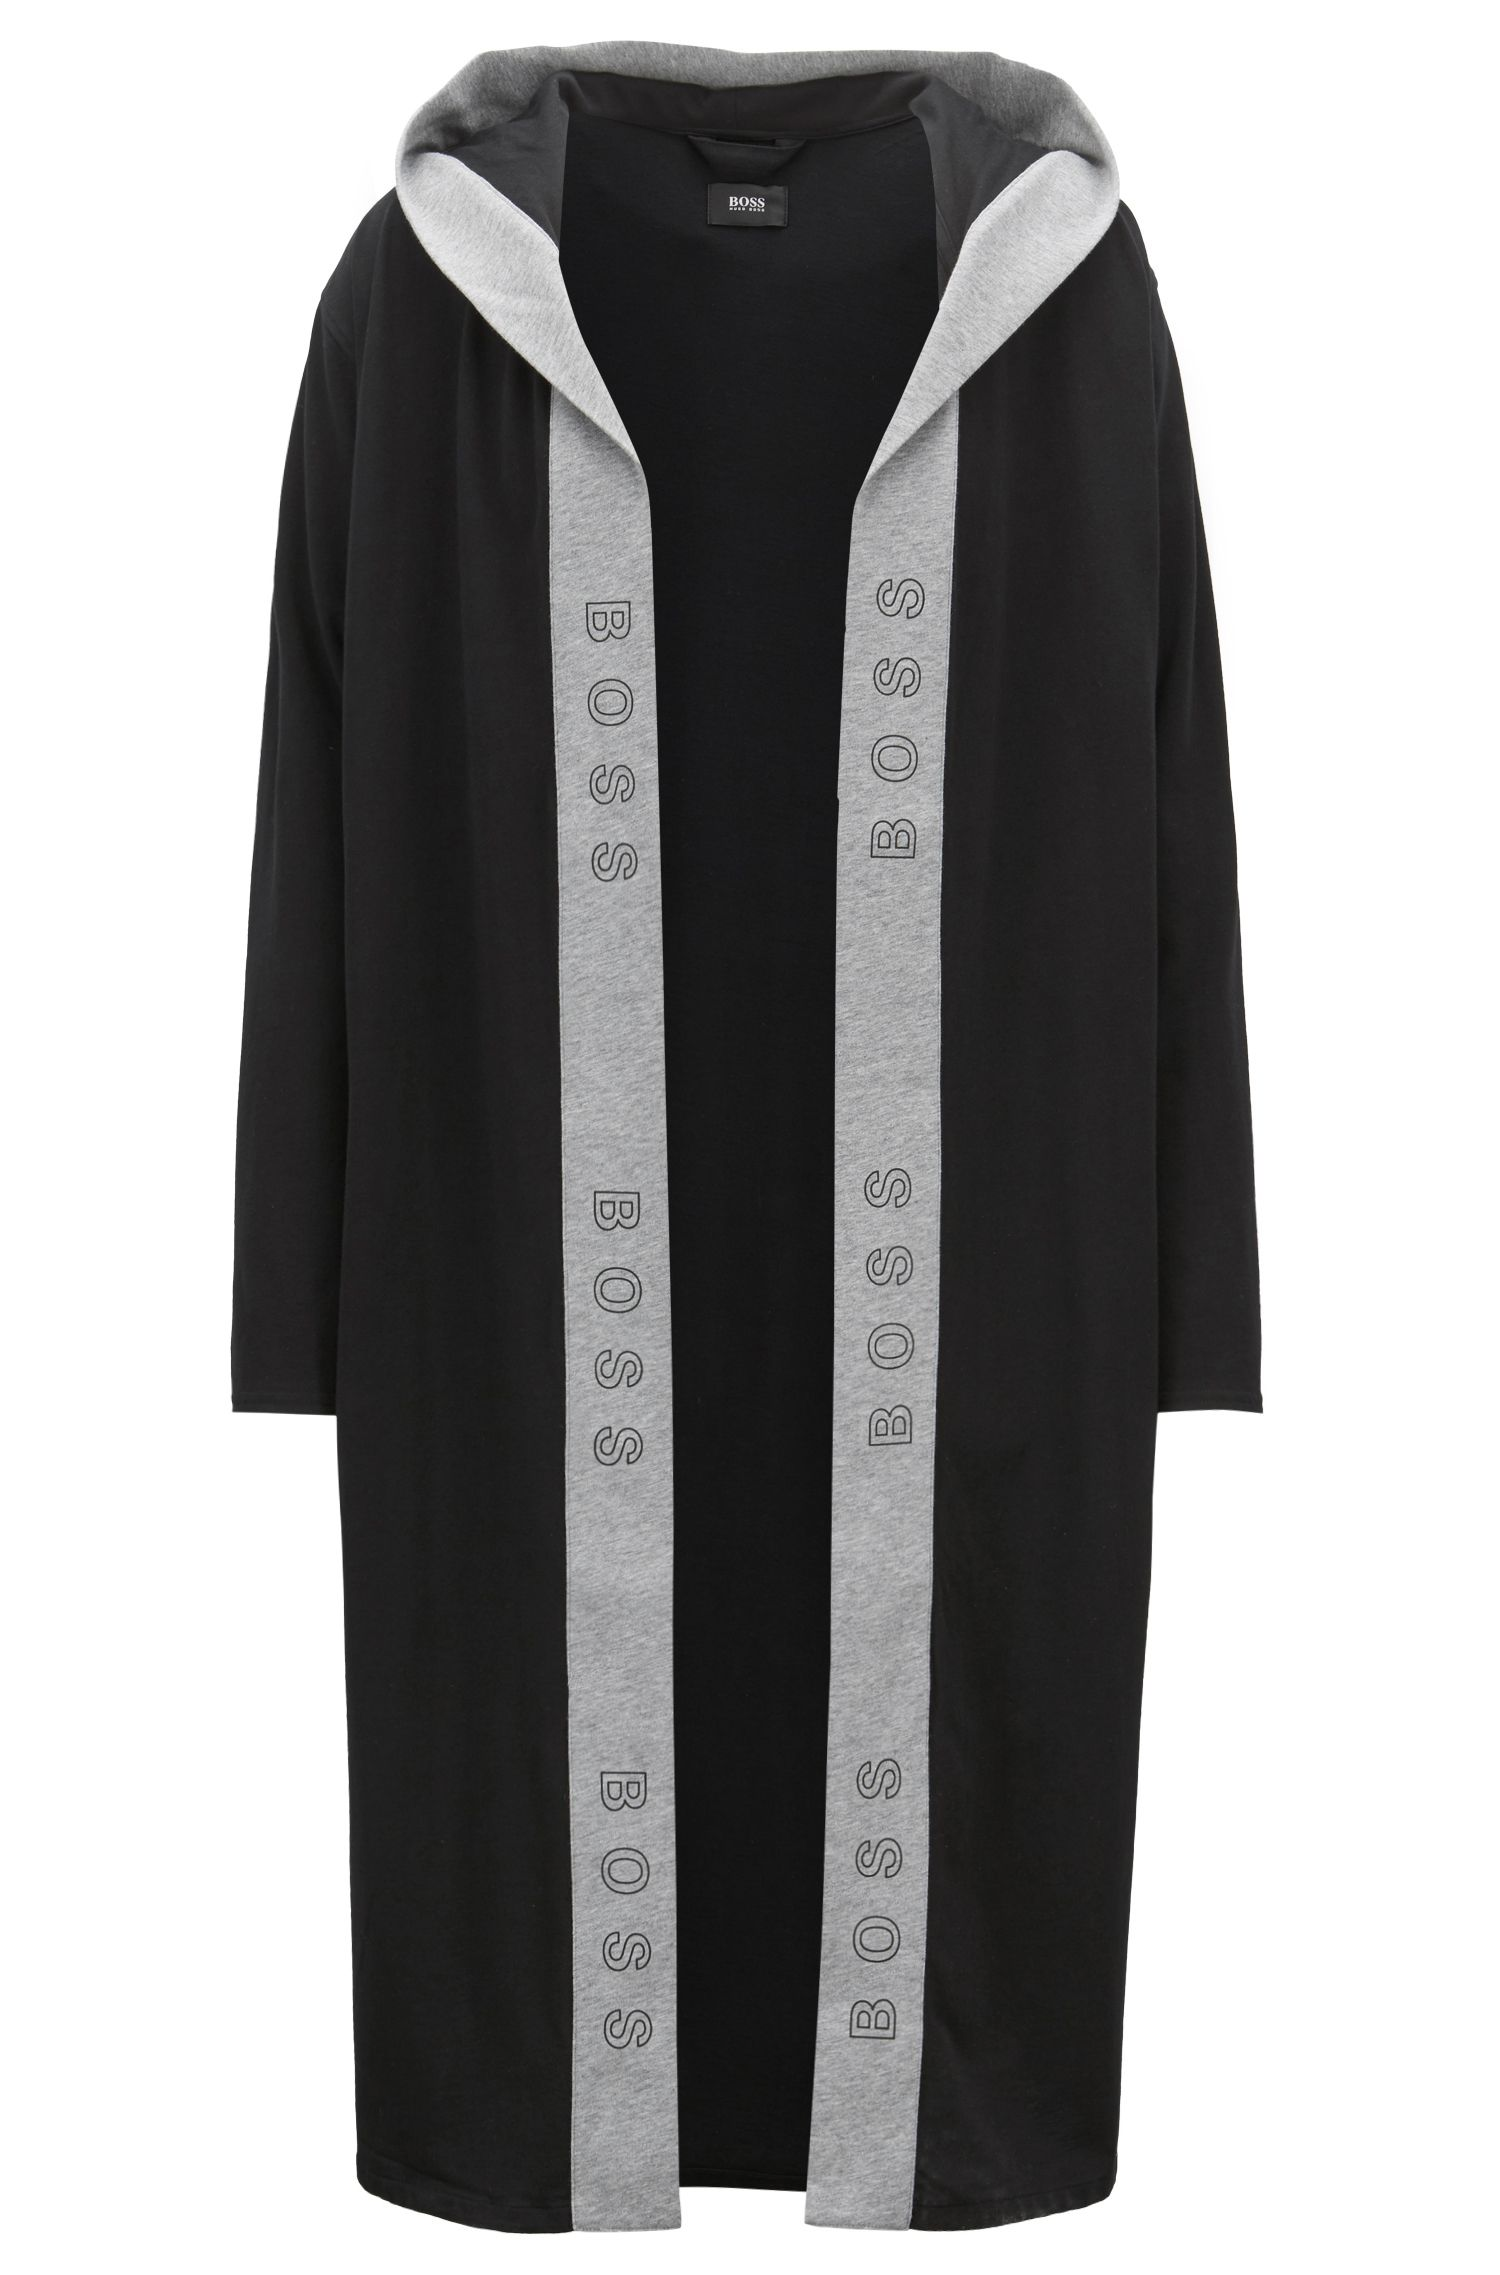 Hooded bathrobe in heavyweight jersey with logo-print trim, Black